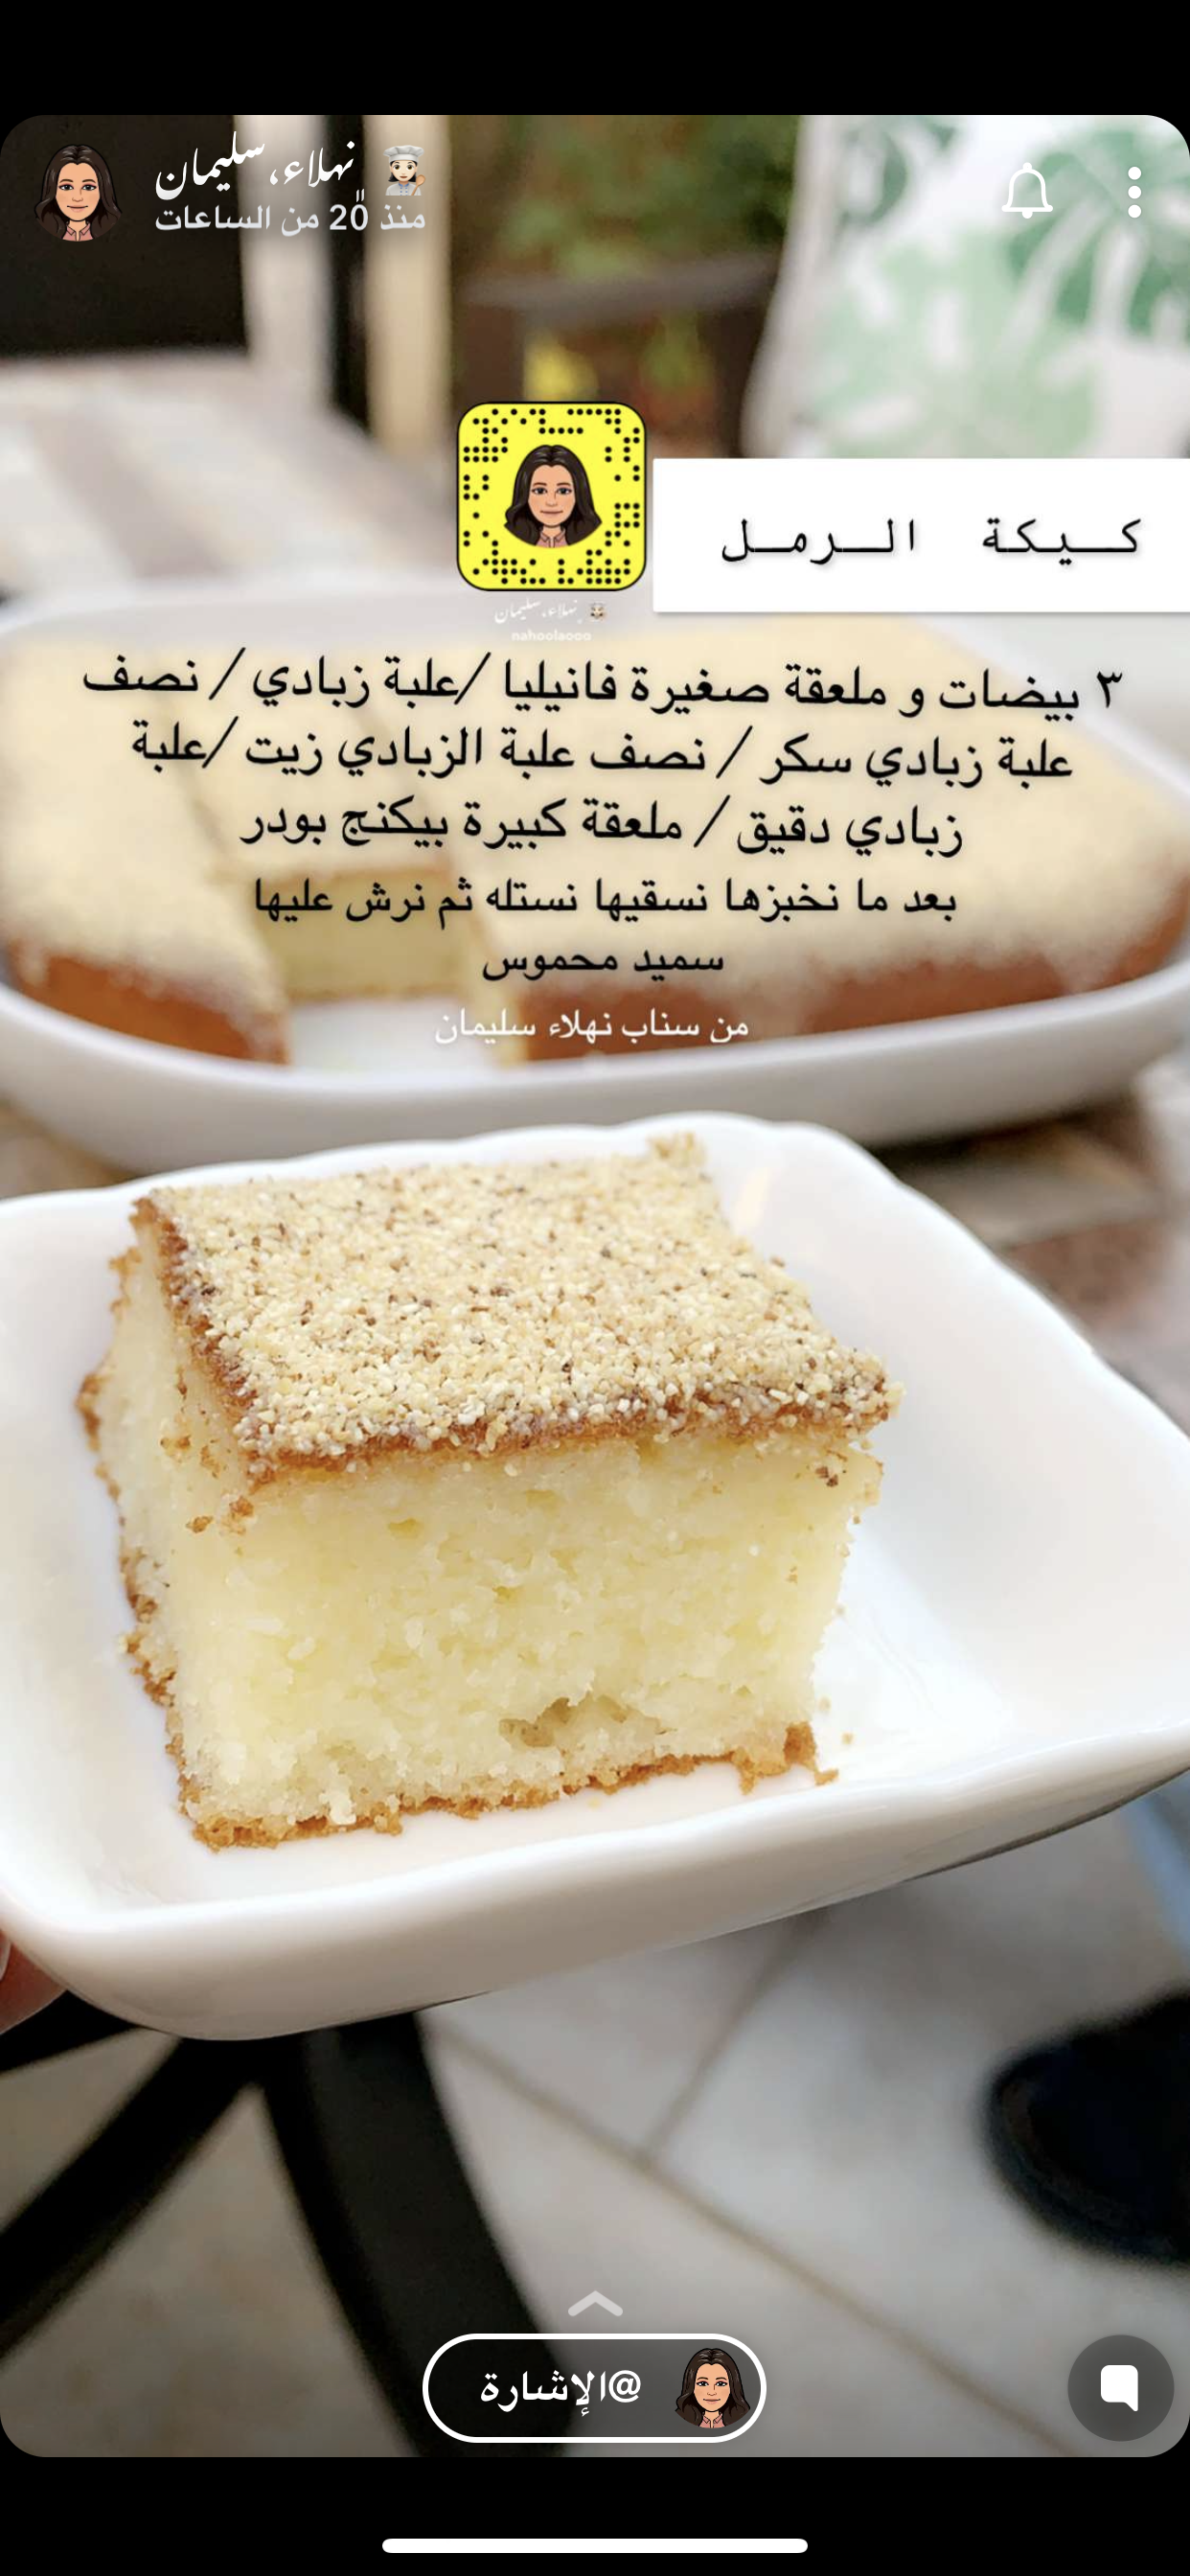 Pin By Salam Moatafa On لذيذ Tasty Baking Food Garnishes Diy Food Recipes